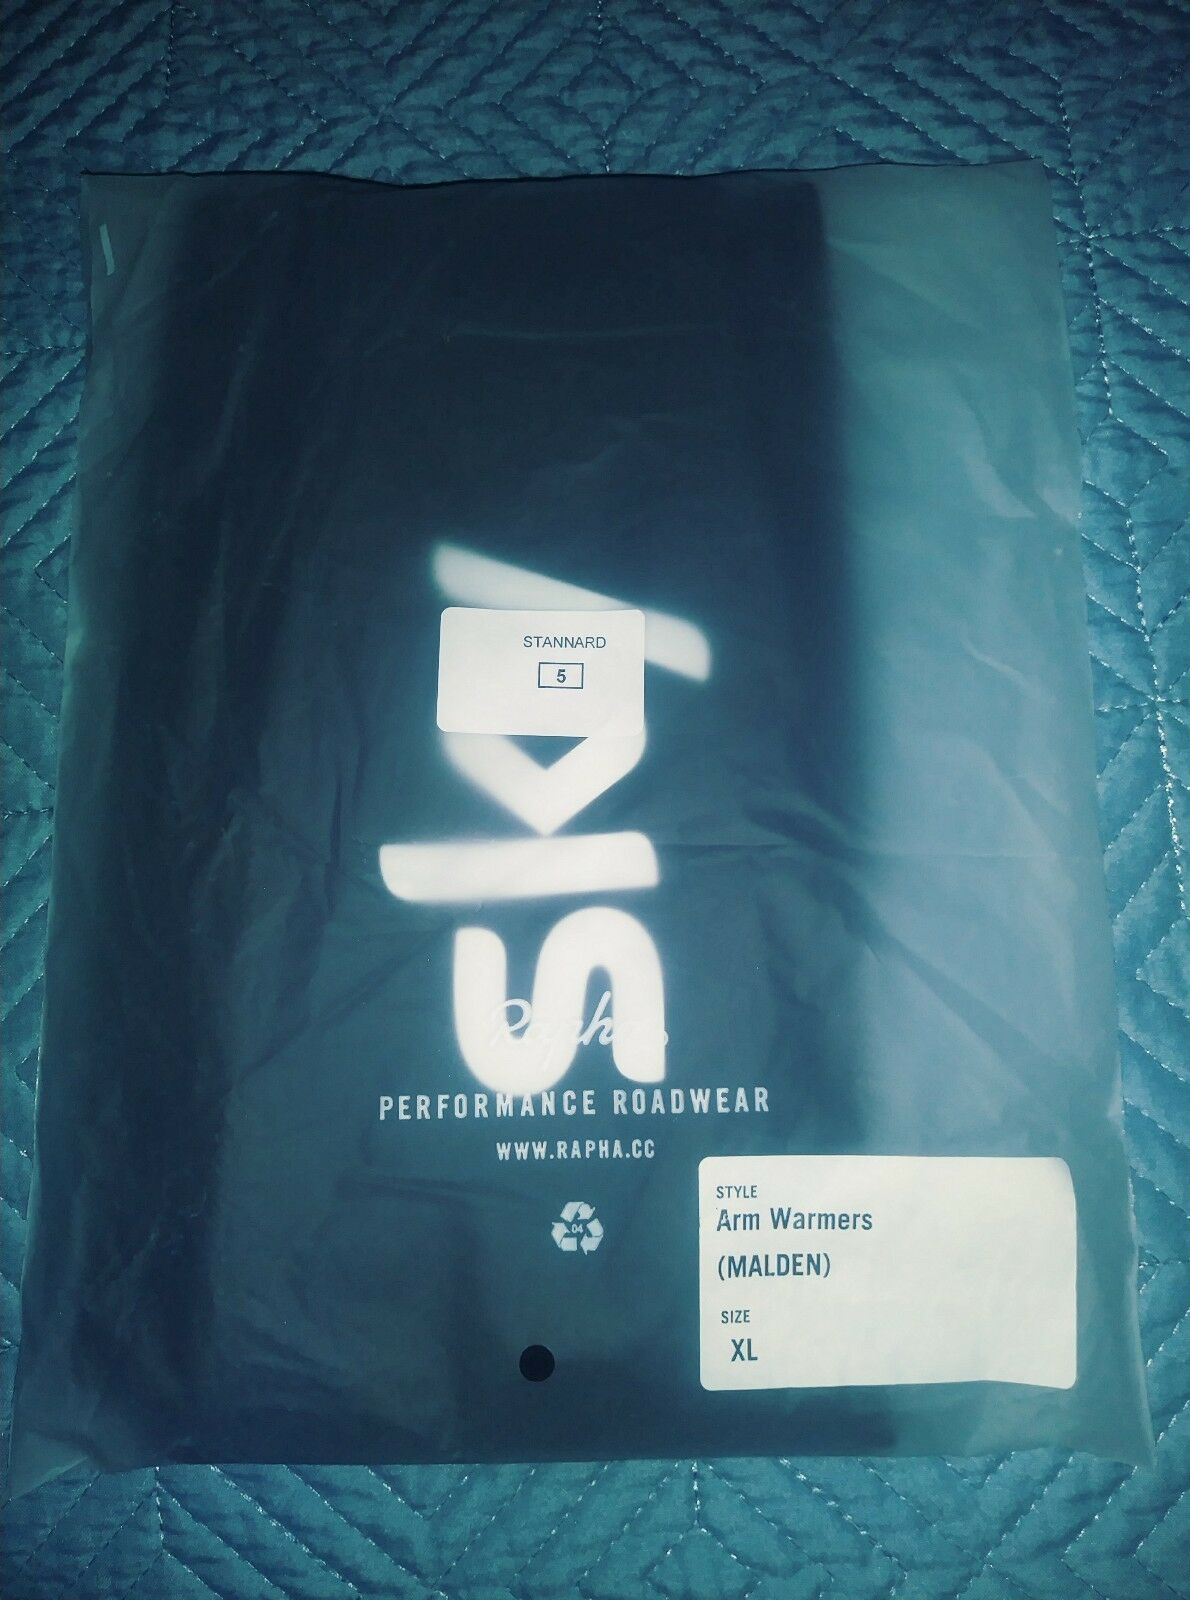 Rapha Team Sky Arm Warmers TEAM ISSUED to Ian Stannard size 5 (XL)